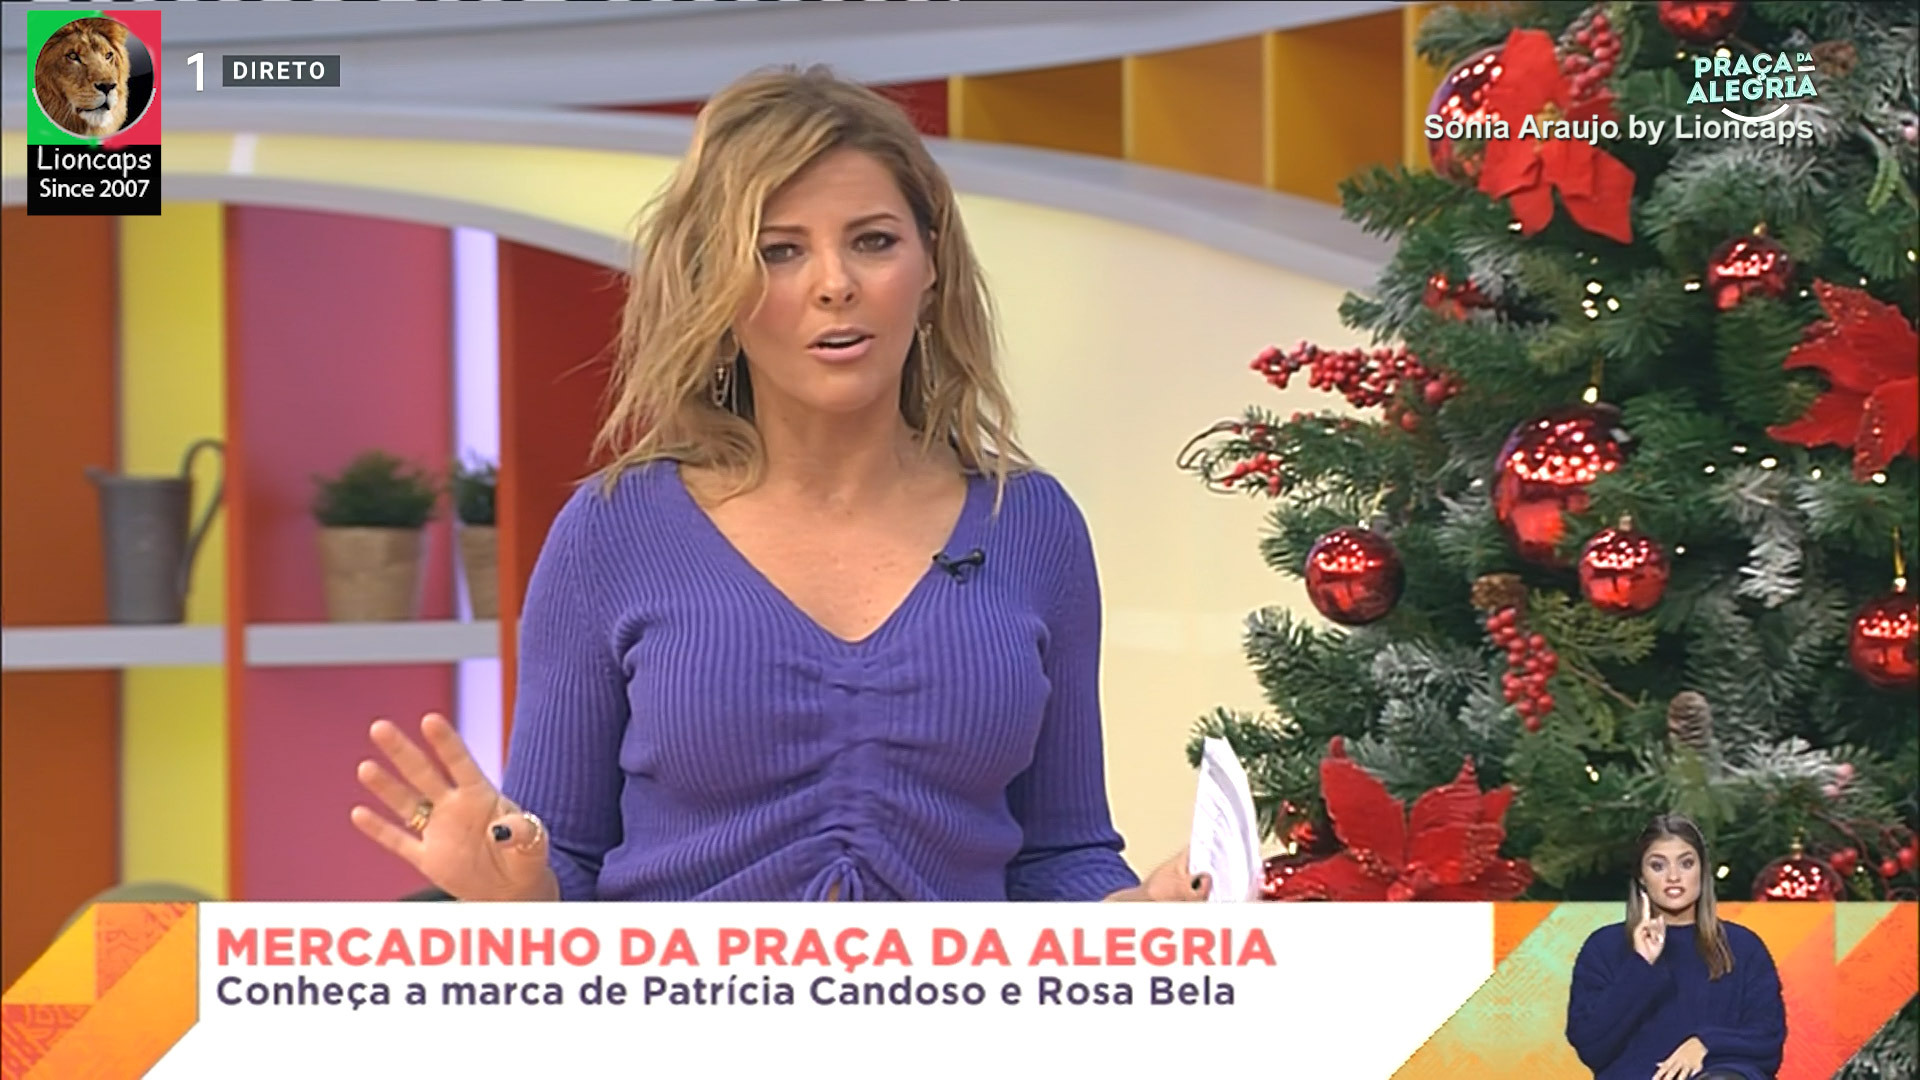 sonia_araujo_praca_lioncaps_27_03_2021_02 (3).jpg